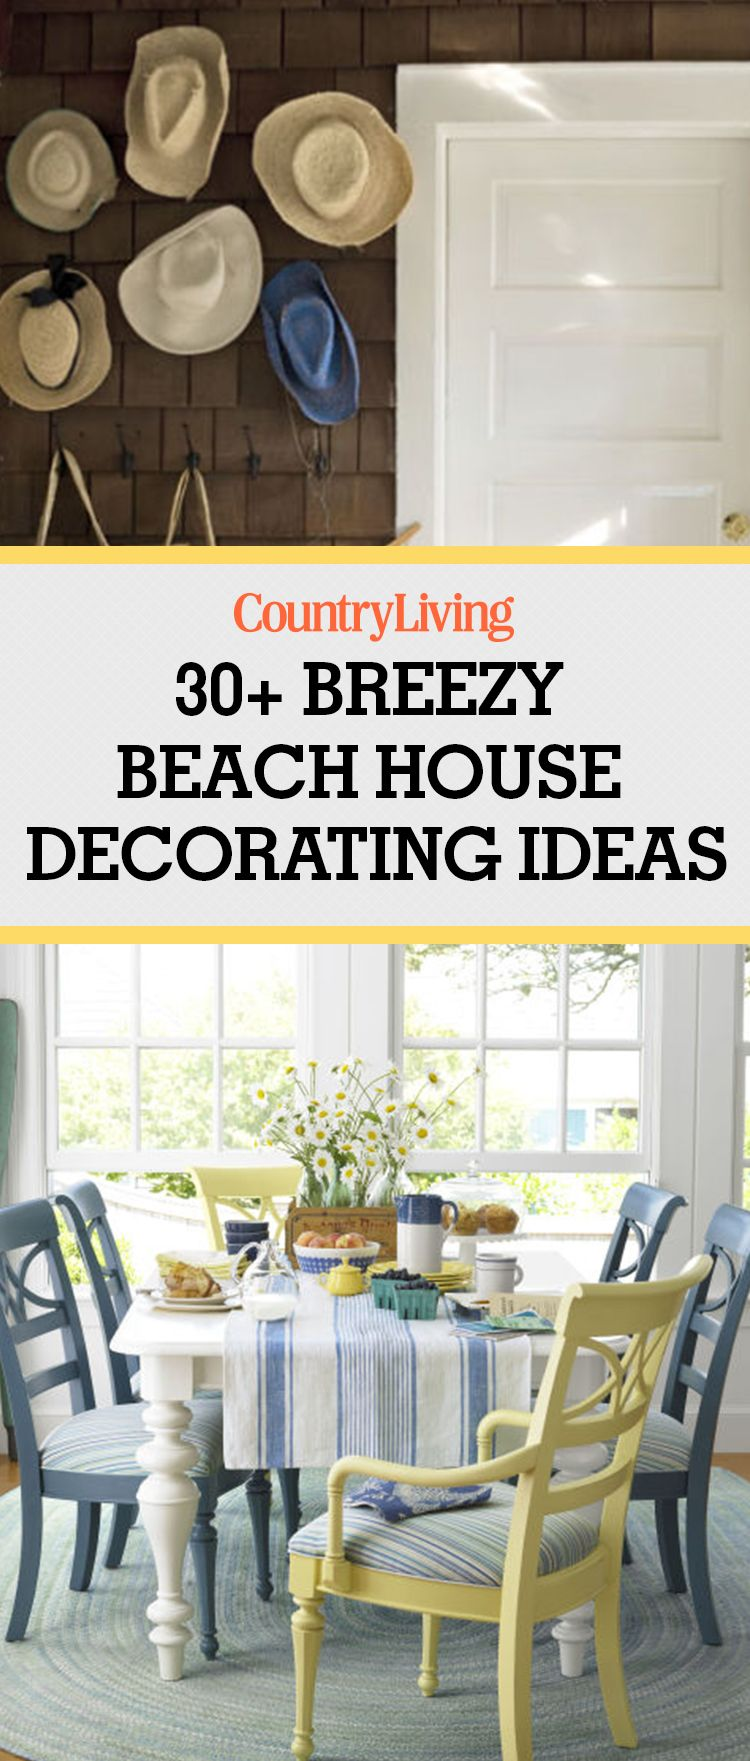 Intriguing 1490301426 30 Easy Breezy Beach House Decorating Ideas Beach Decorating Ideas On A Budget Beach Condo Decorating Ideas home decor Beach Decorating Ideas